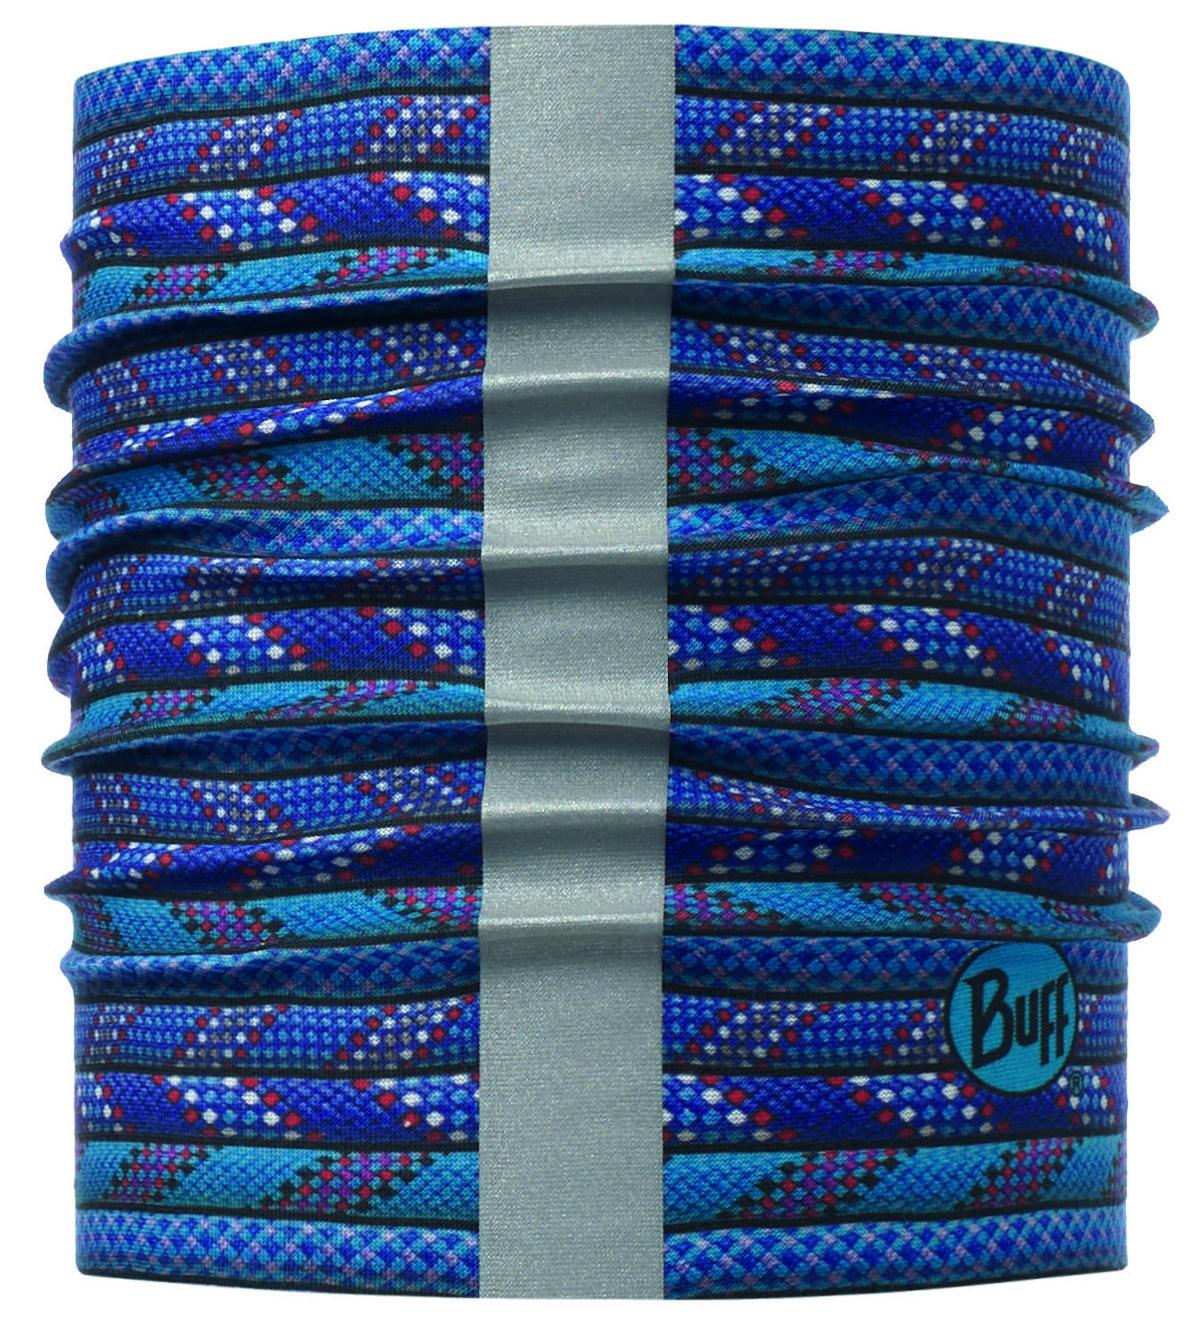 Buff modelo R-Cordes Blue S/M- M/L: Productos y servicios de Més Que Gossos